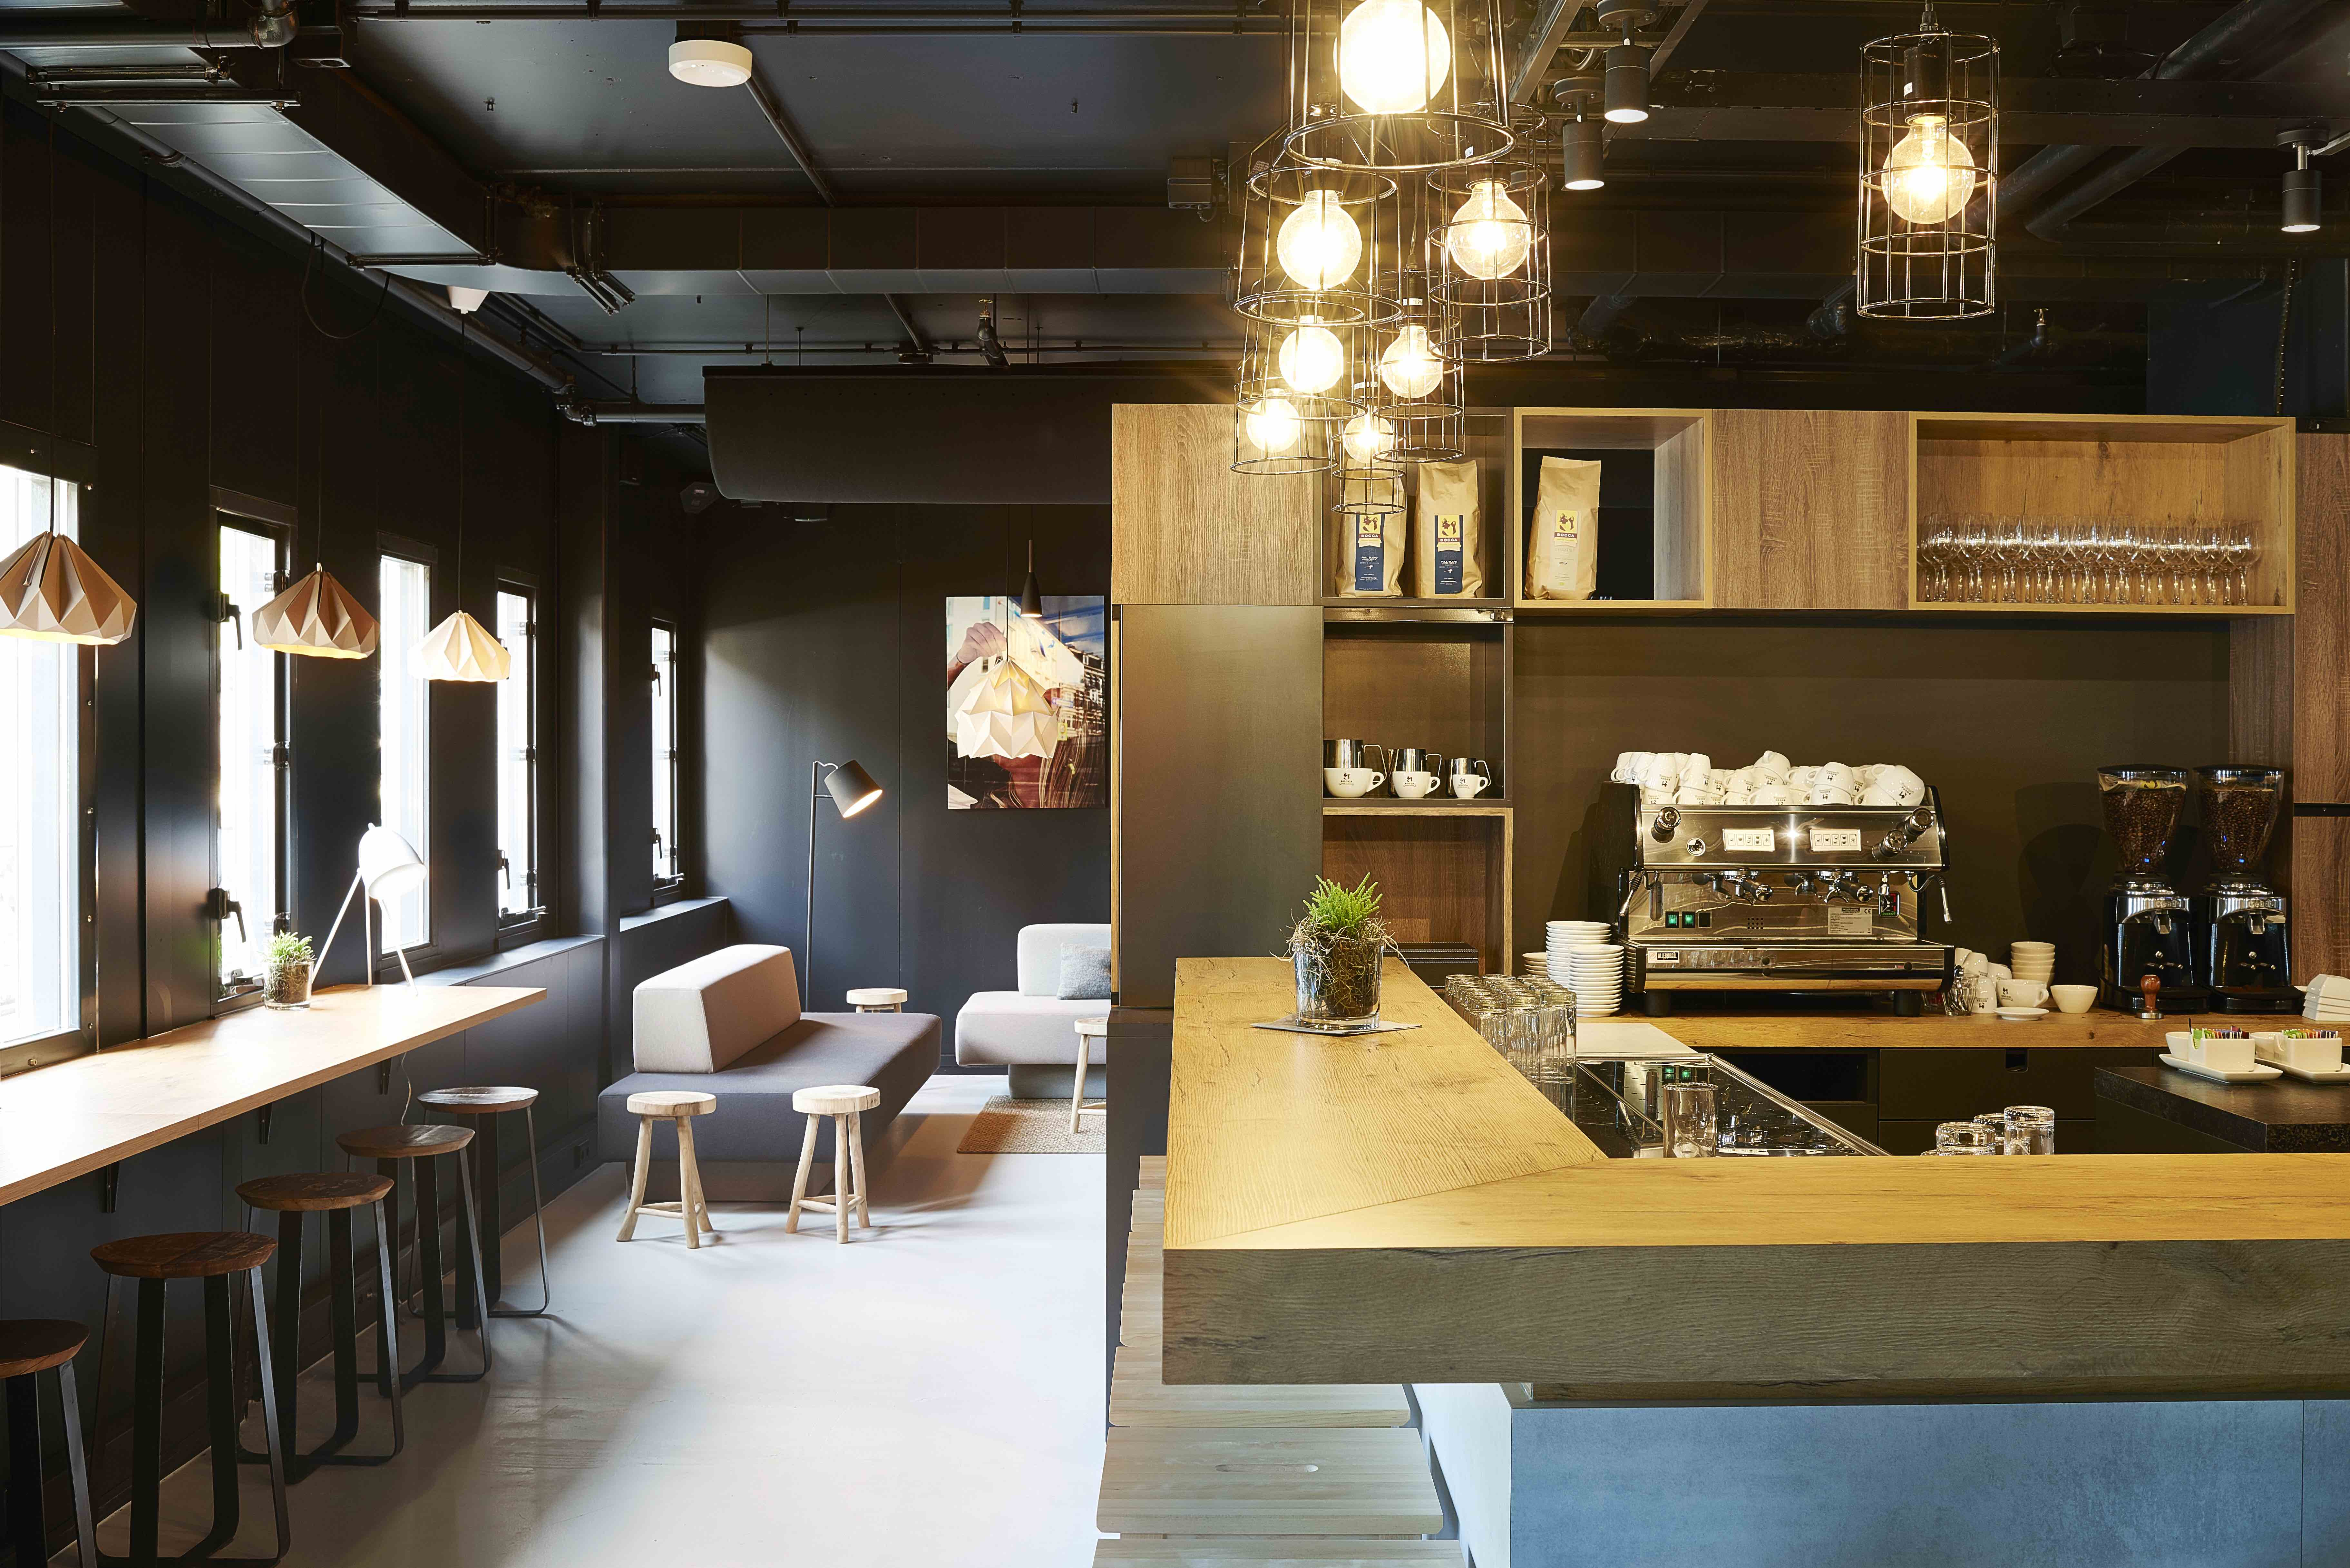 Good hotel cafe